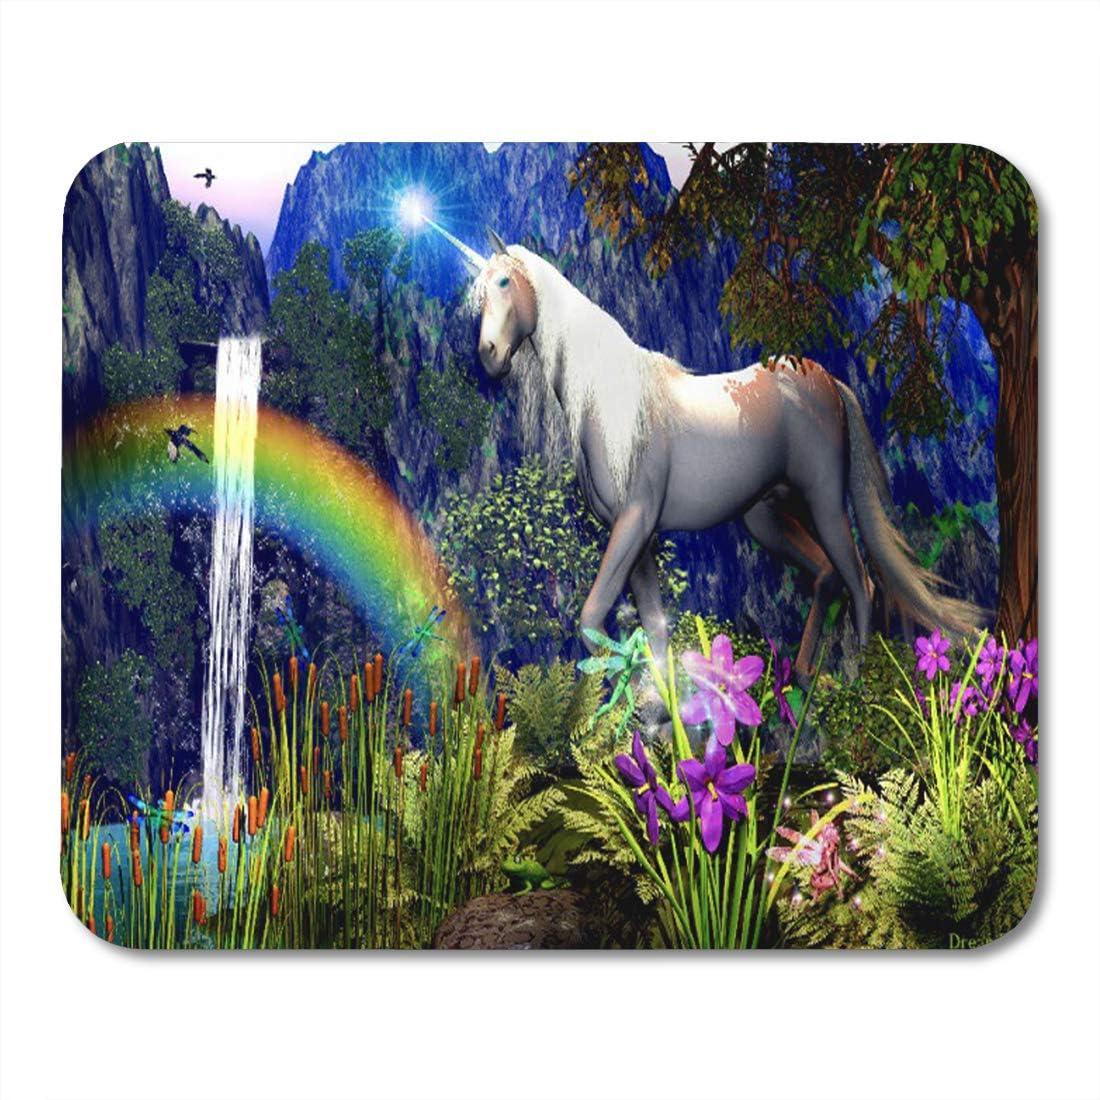 Rainbow Waterfalls Of Dreams Mousepad Mouse Pad Mat